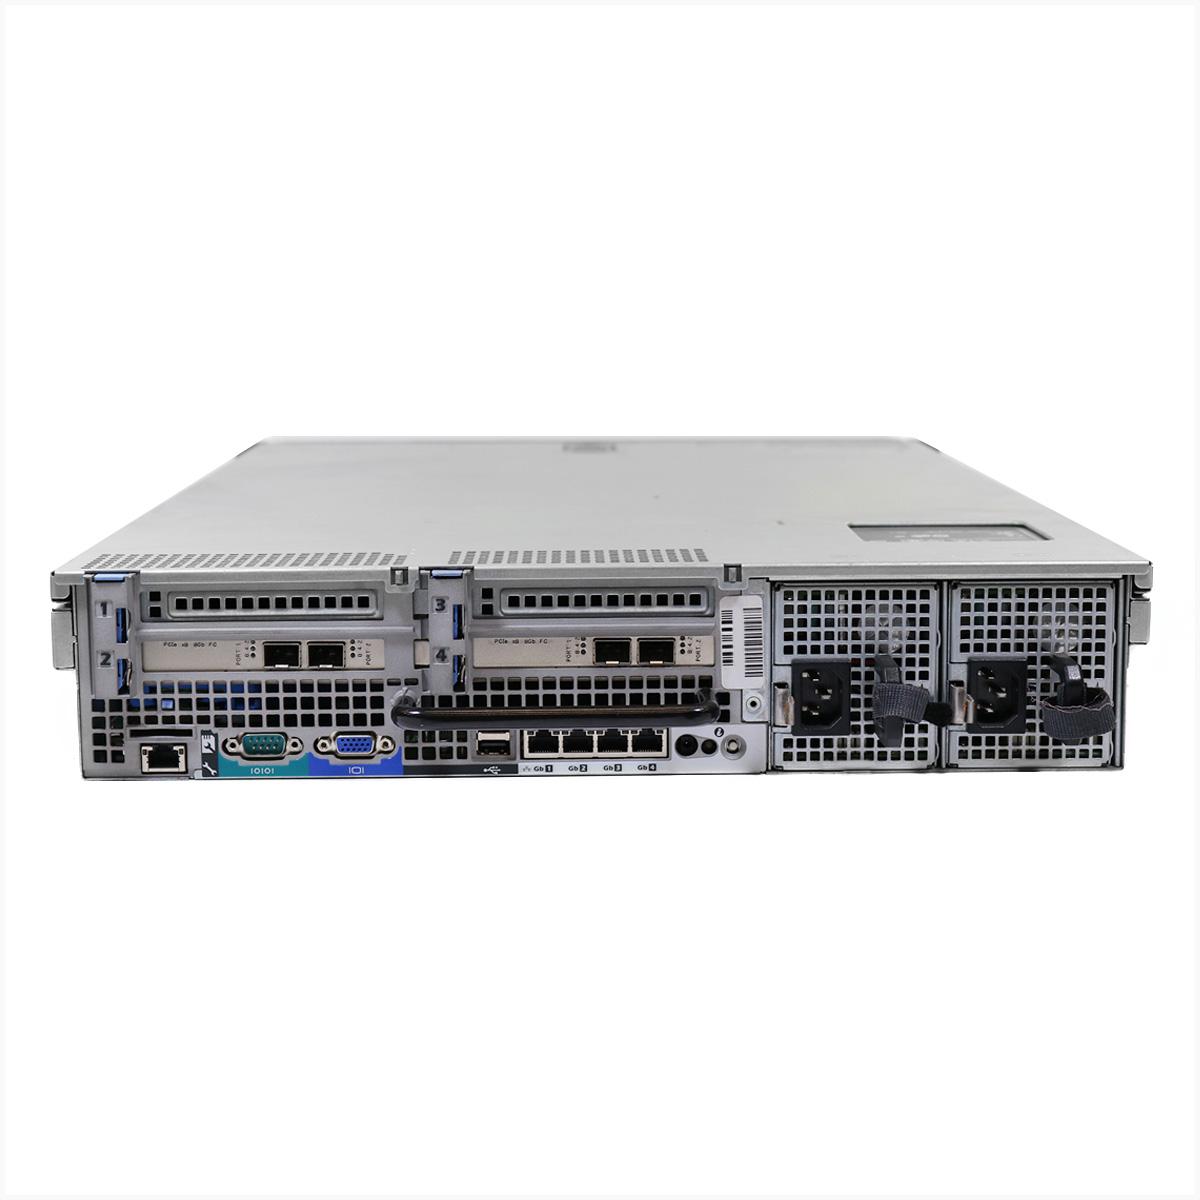 Servidor dell r710 2x xeon x5650 64gb 2x 1tb - usado